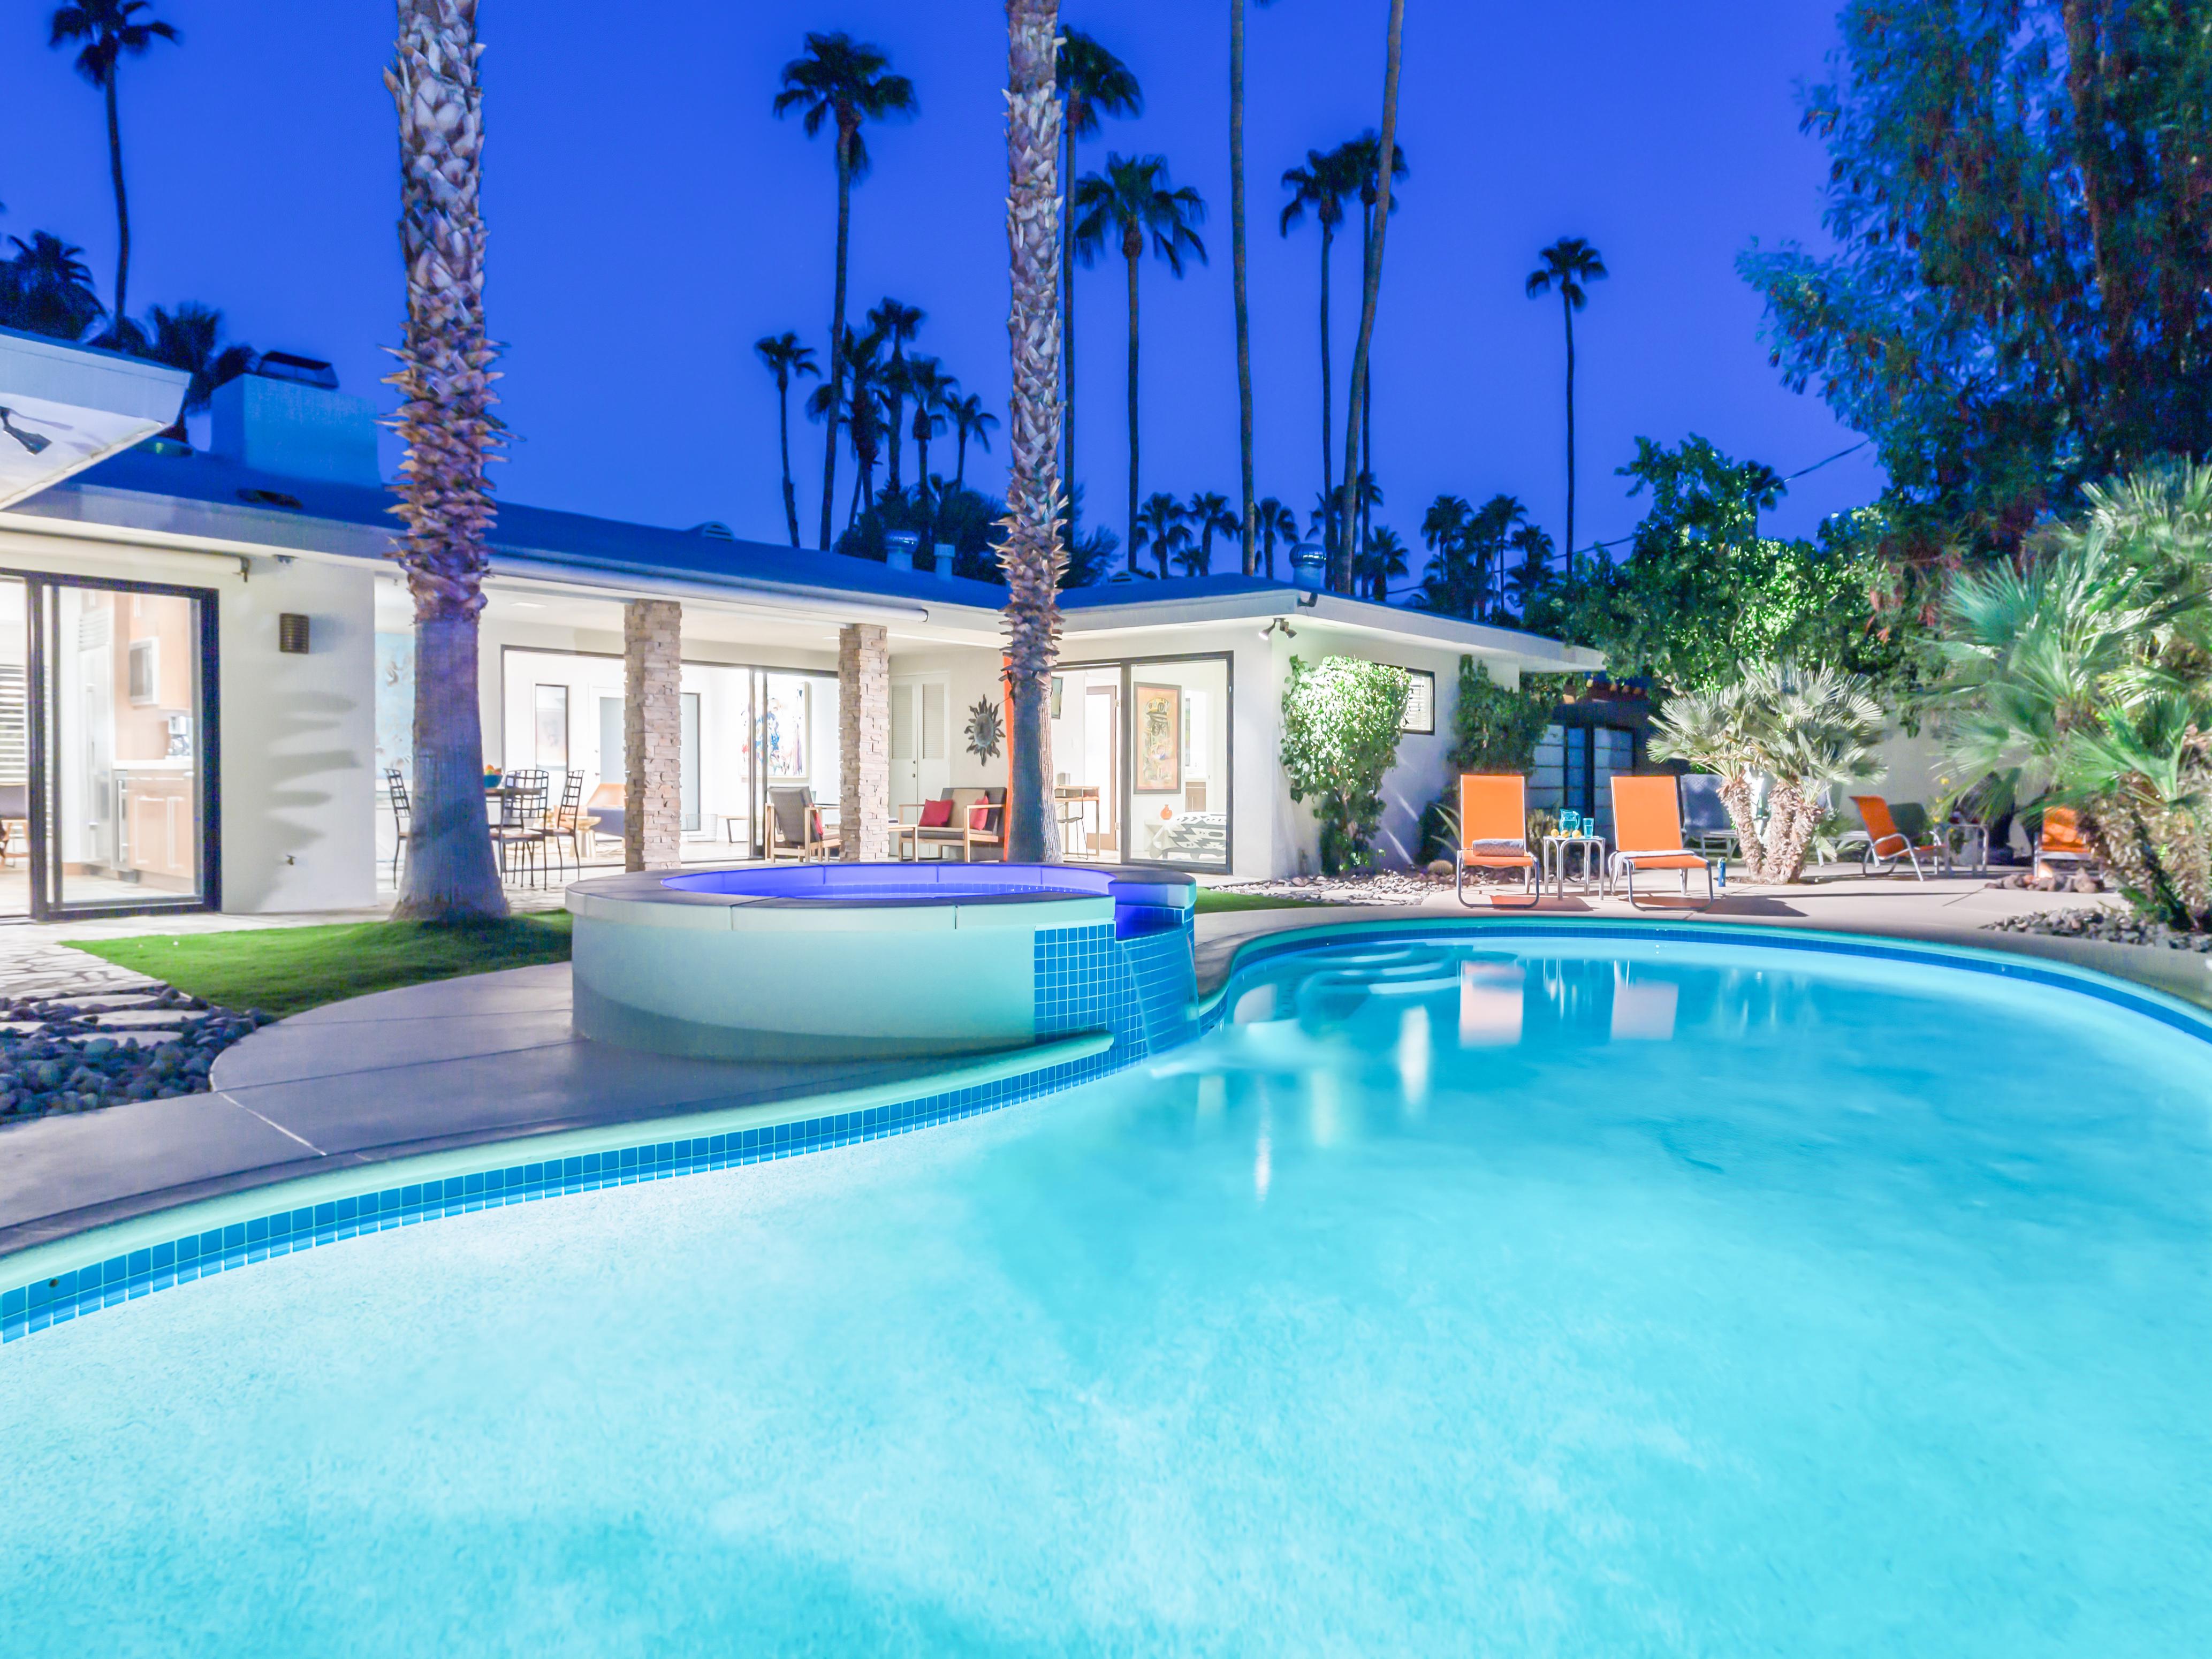 The Marley Estate in Palm Springs - Dawn McCoy